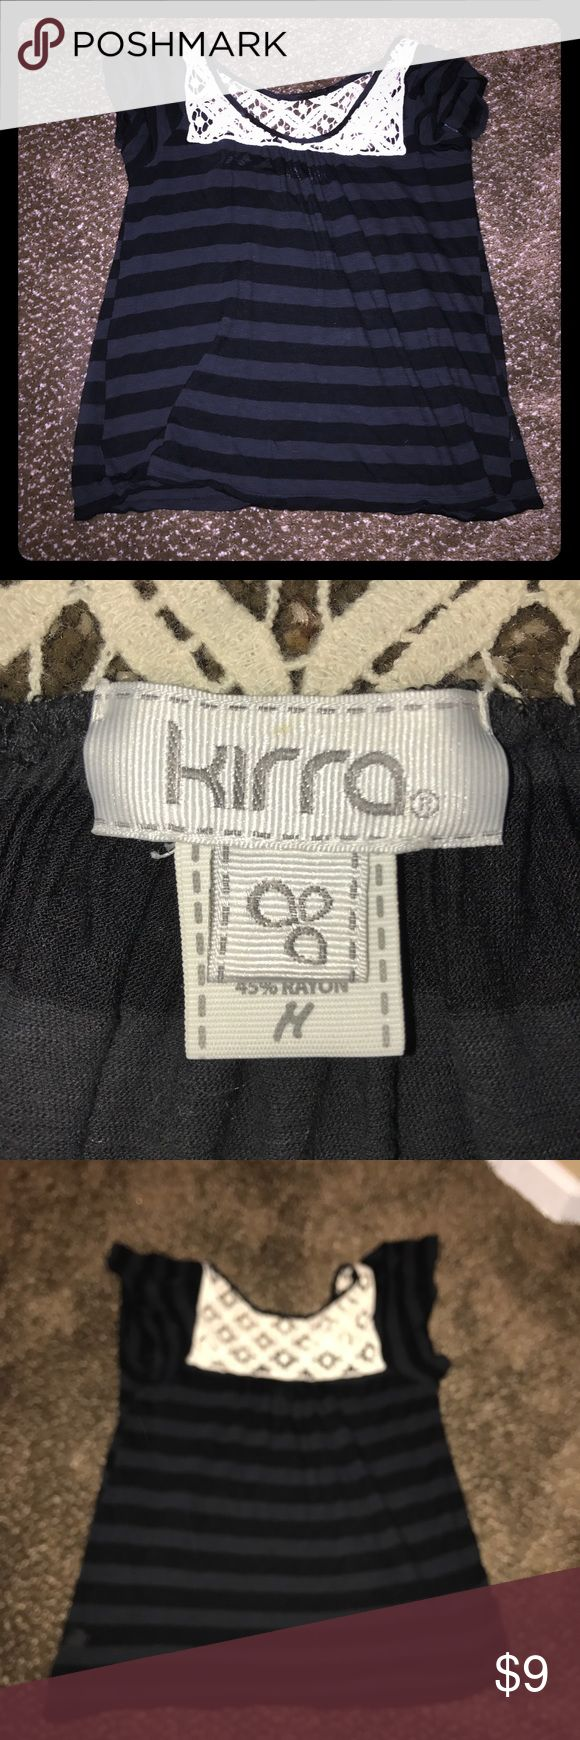 Kirra top Like new striped top. Size medium Kirra Tops Tees - Short Sleeve